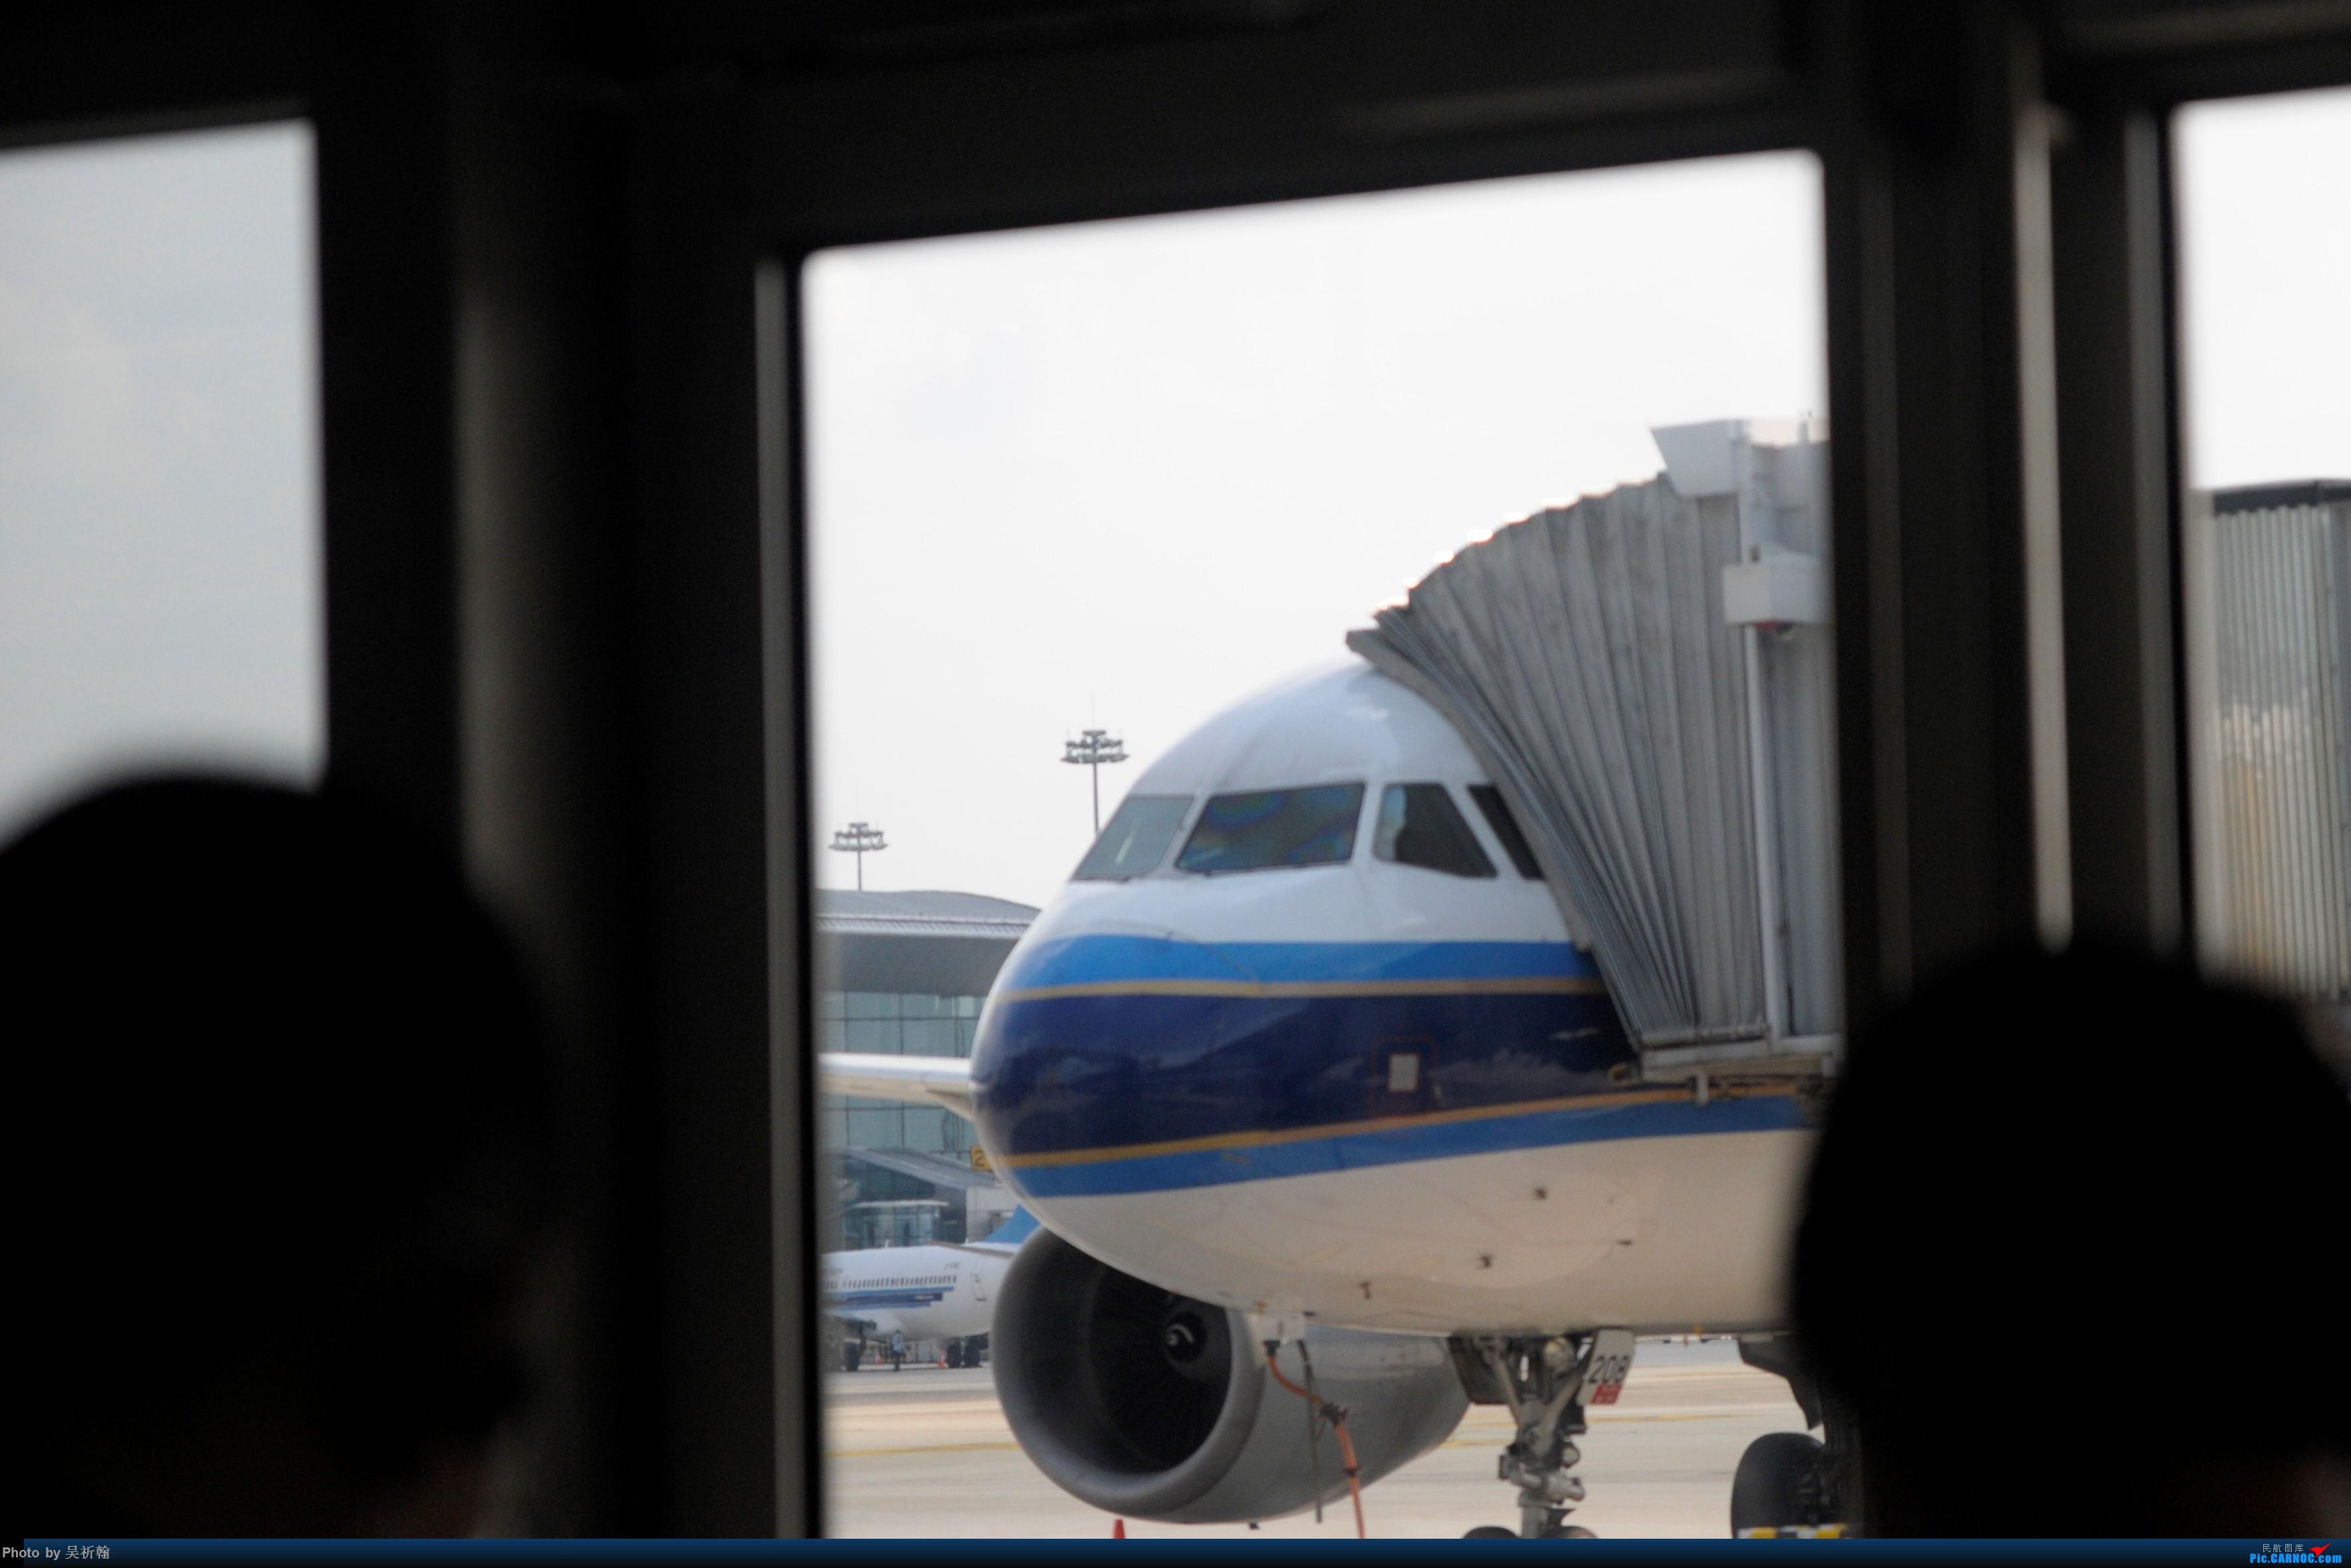 Re:[原创]Kian的飞行游记1:飞往无锡 AIRBUS A320  中国广州白云国际机场